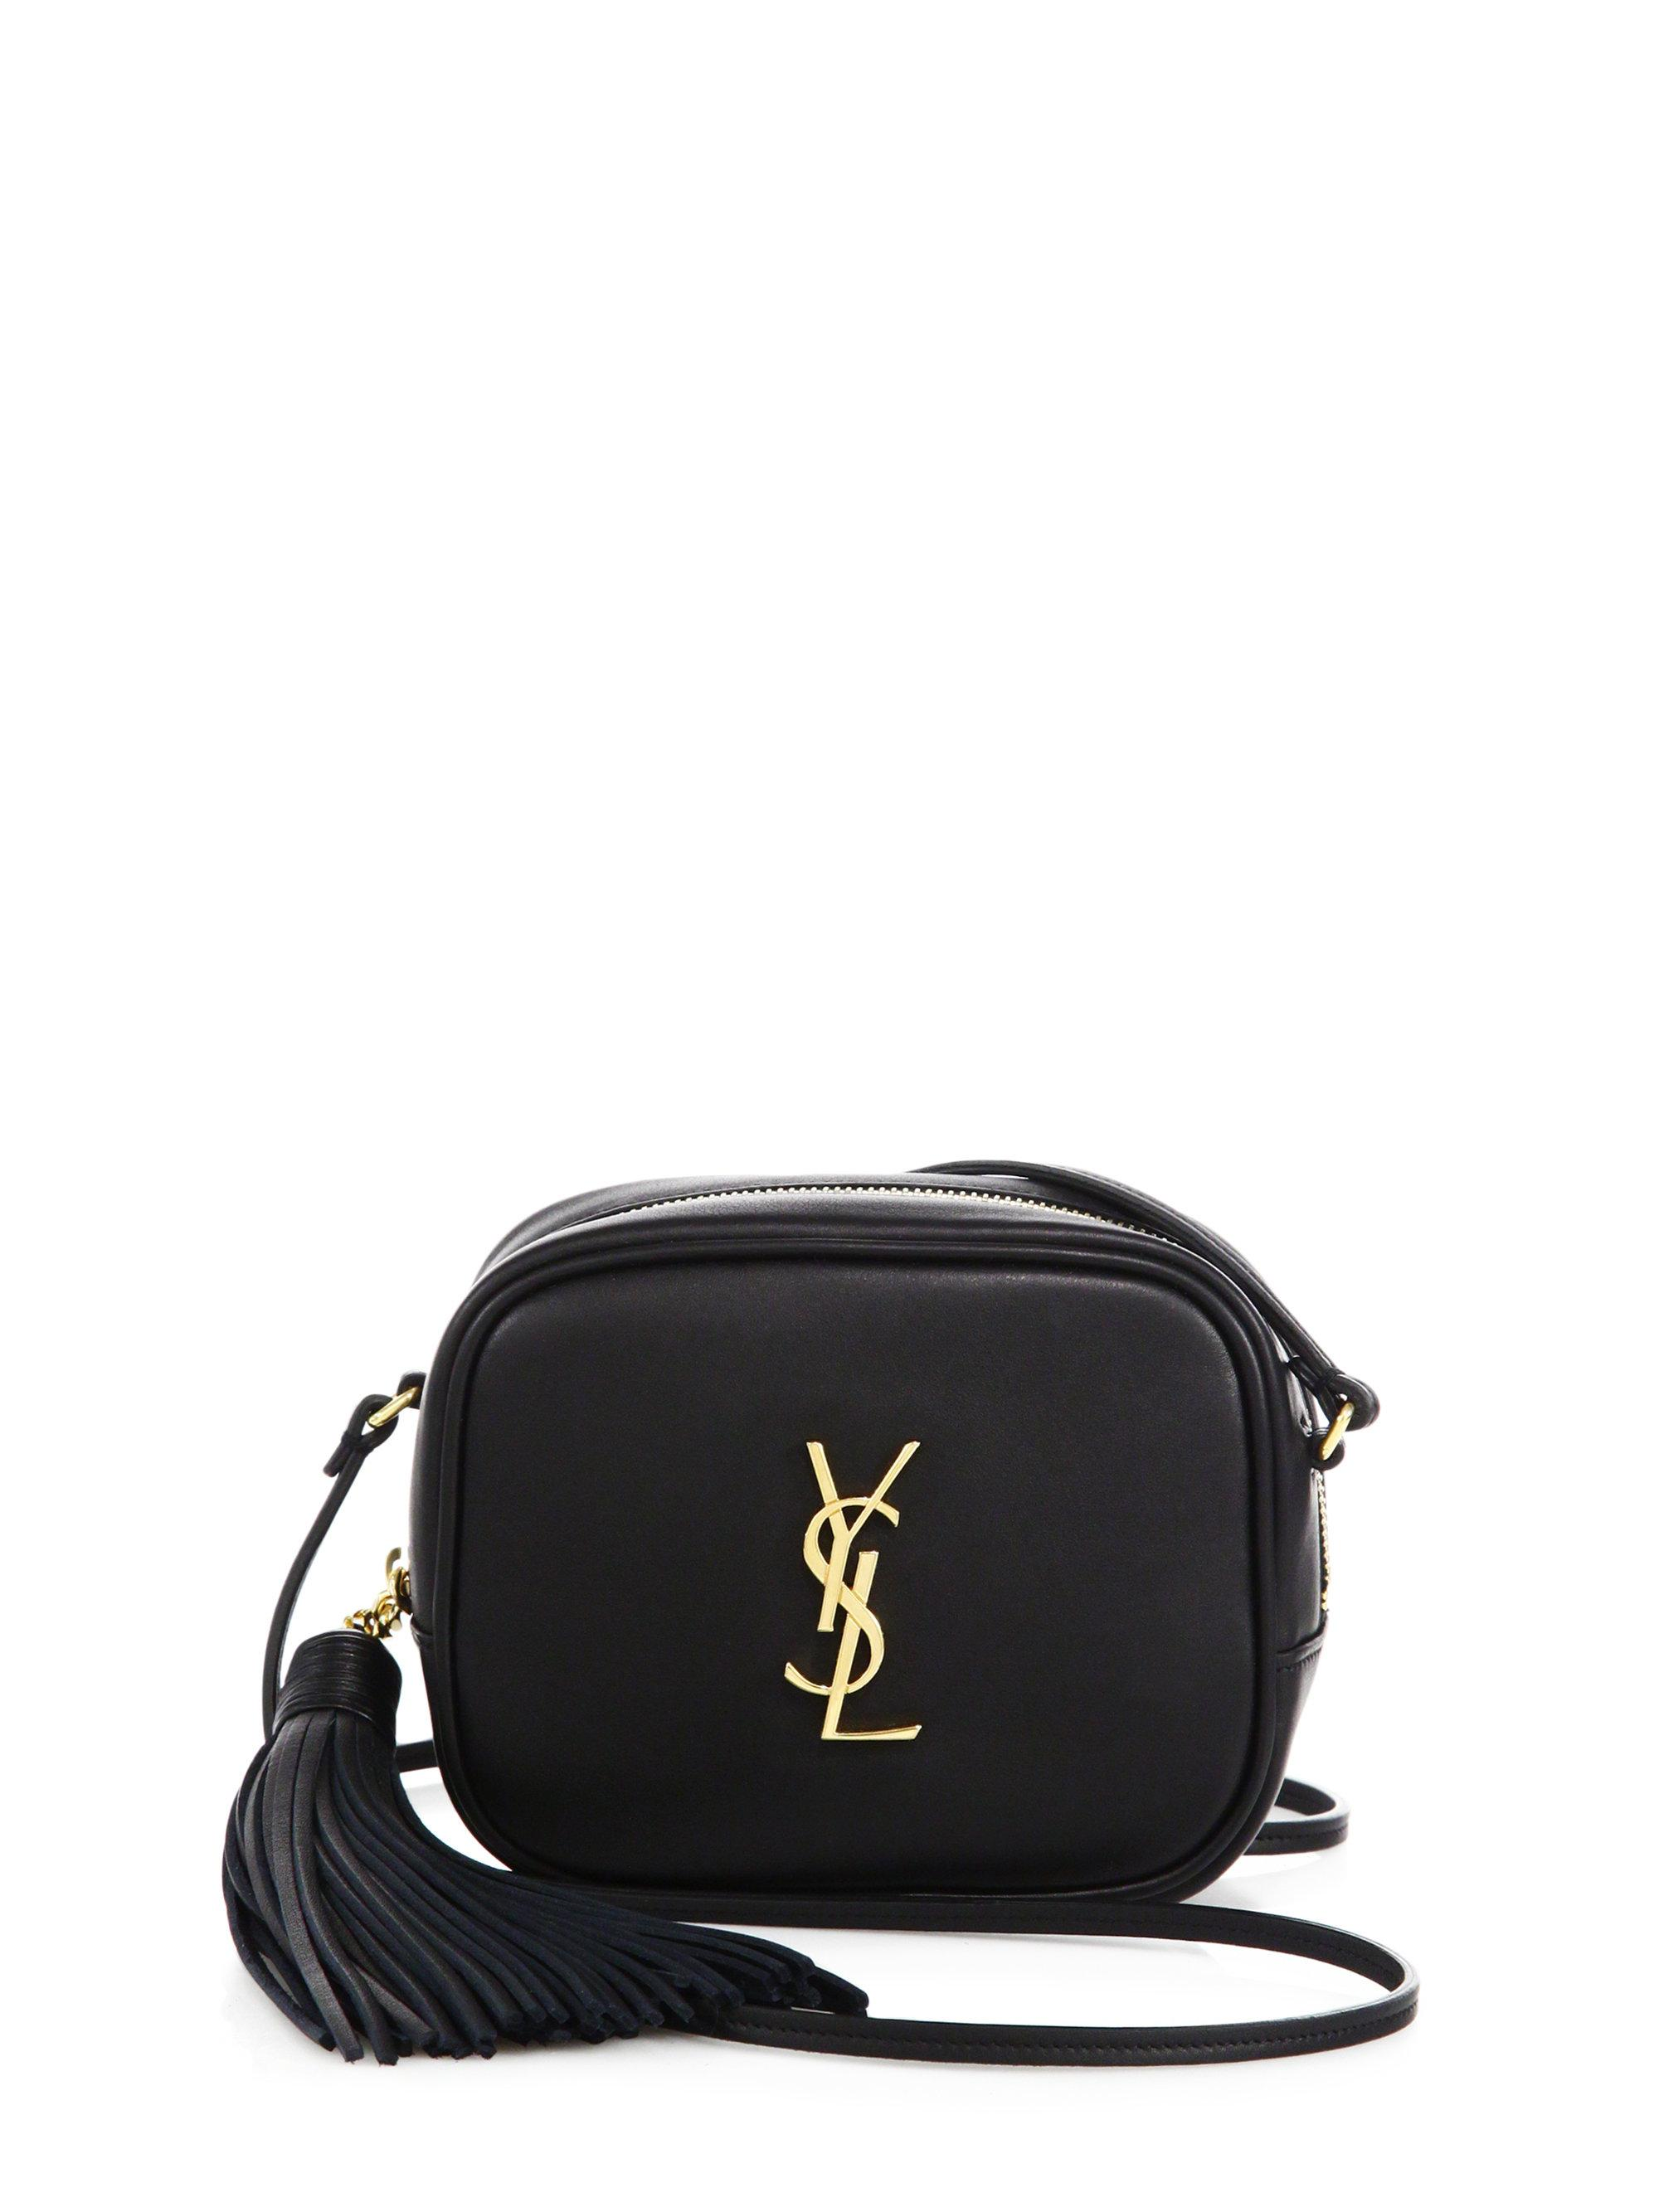 0db2b852d5 Lyst - Saint Laurent Leather Monogram Blogger Bag in Black